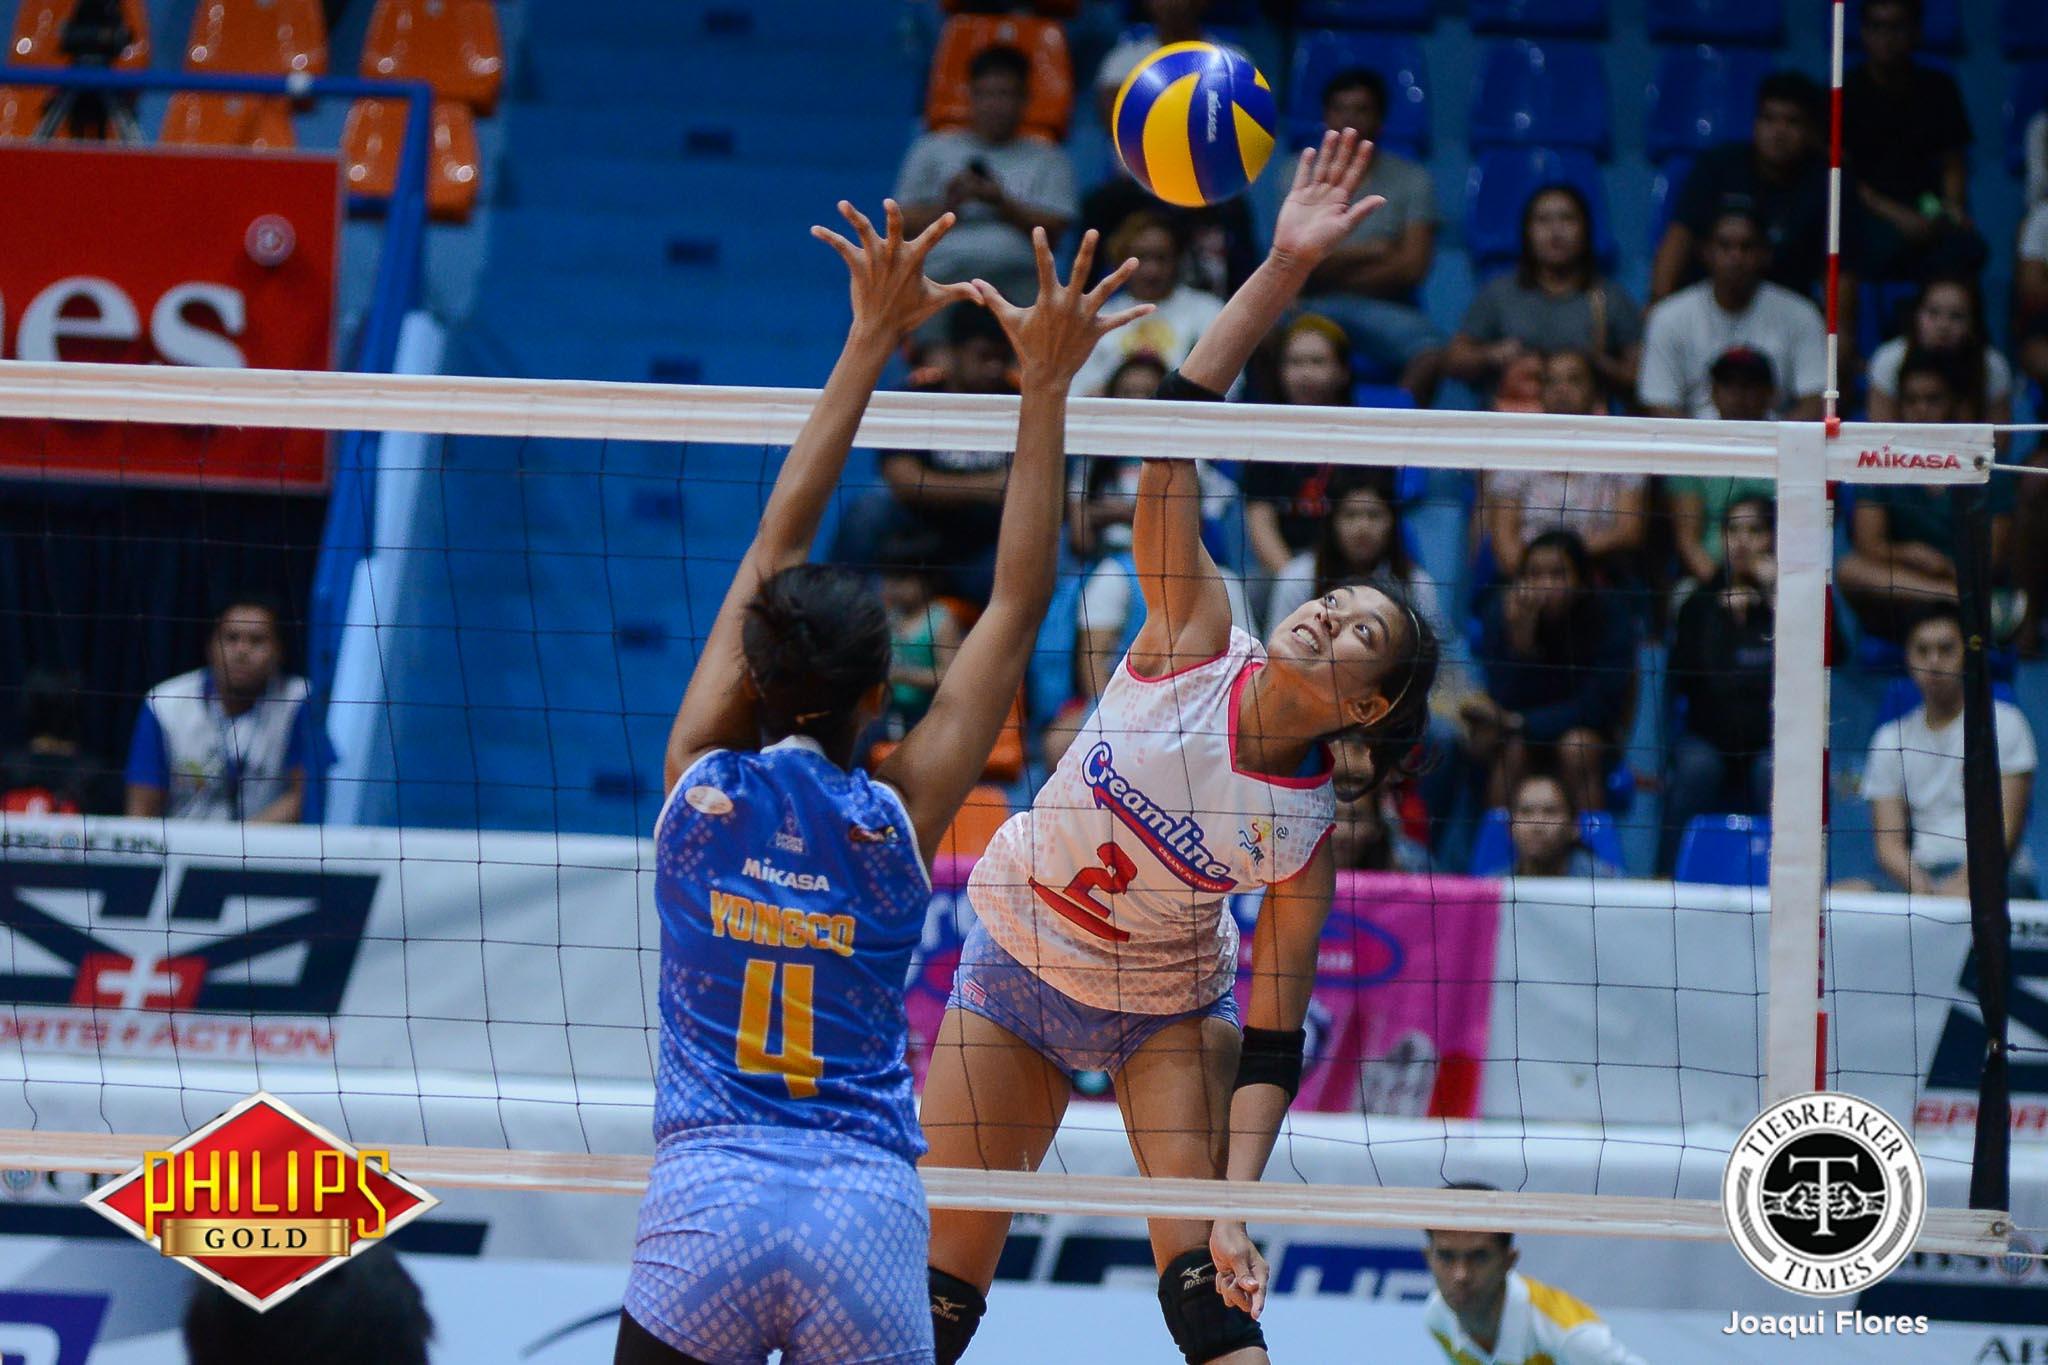 Philippine Sports News - Tiebreaker Times Rebisco withdraws Alyssa Valdez from remaining PVL matches News PVL Volleyball  Creamline Cool Smashers Alyssa Valdez 2017 PVL Women's Open Conference 2017 PVL Season